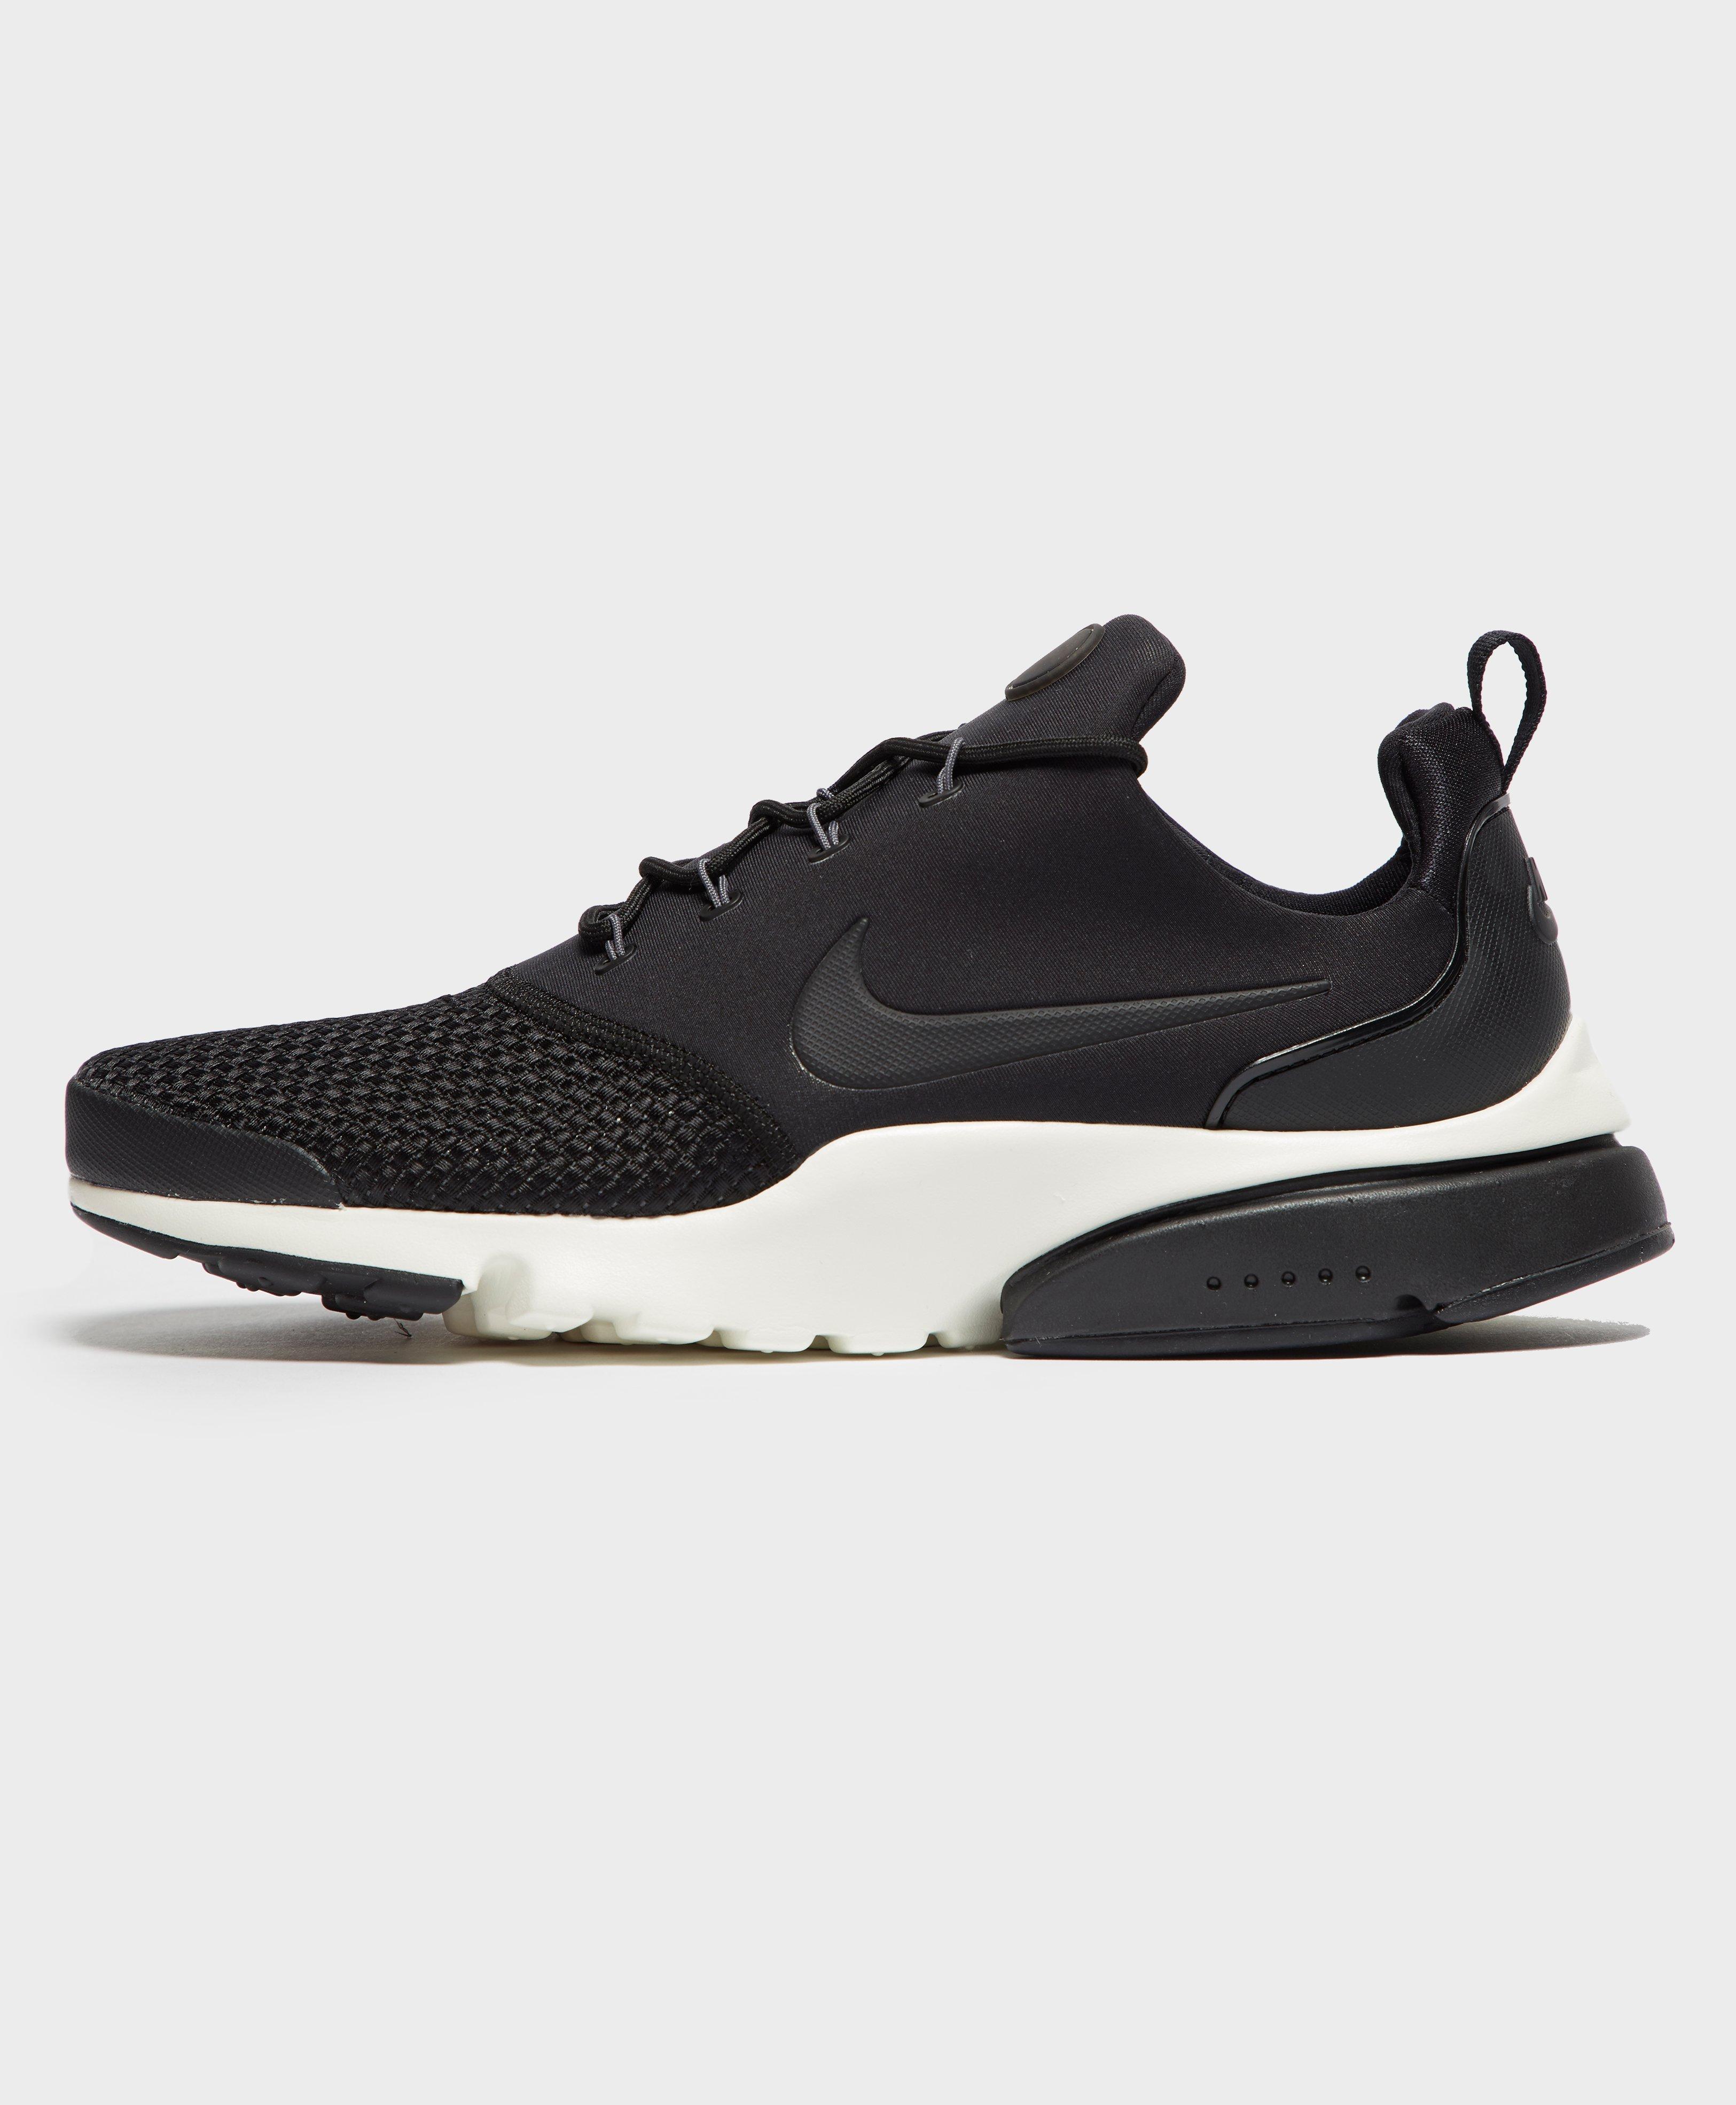 Lyst - Nike Air Presto Fly in Black for Men c753abb14